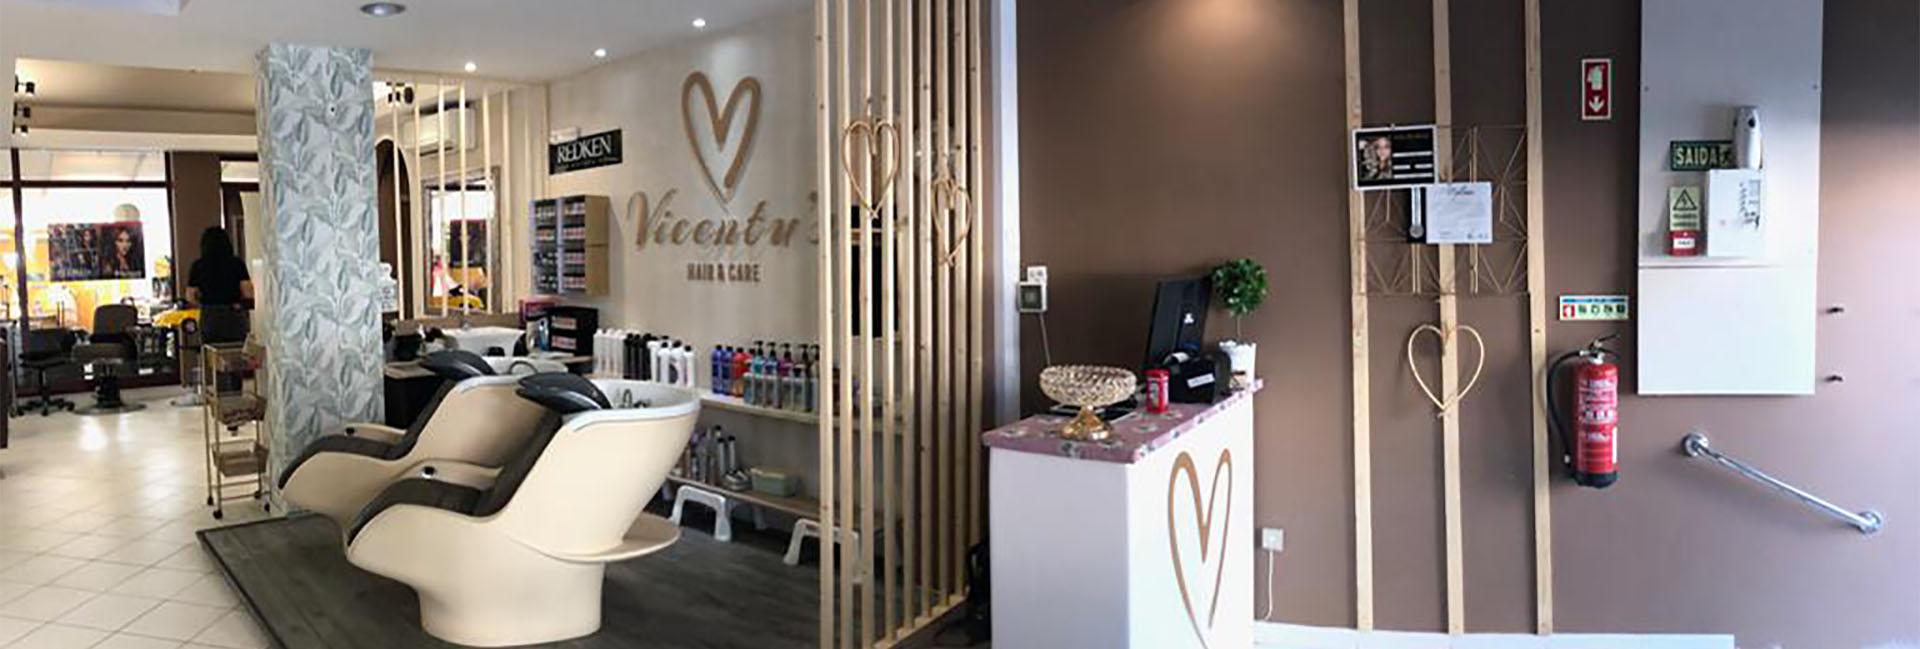 Vincentu's Hair & Care